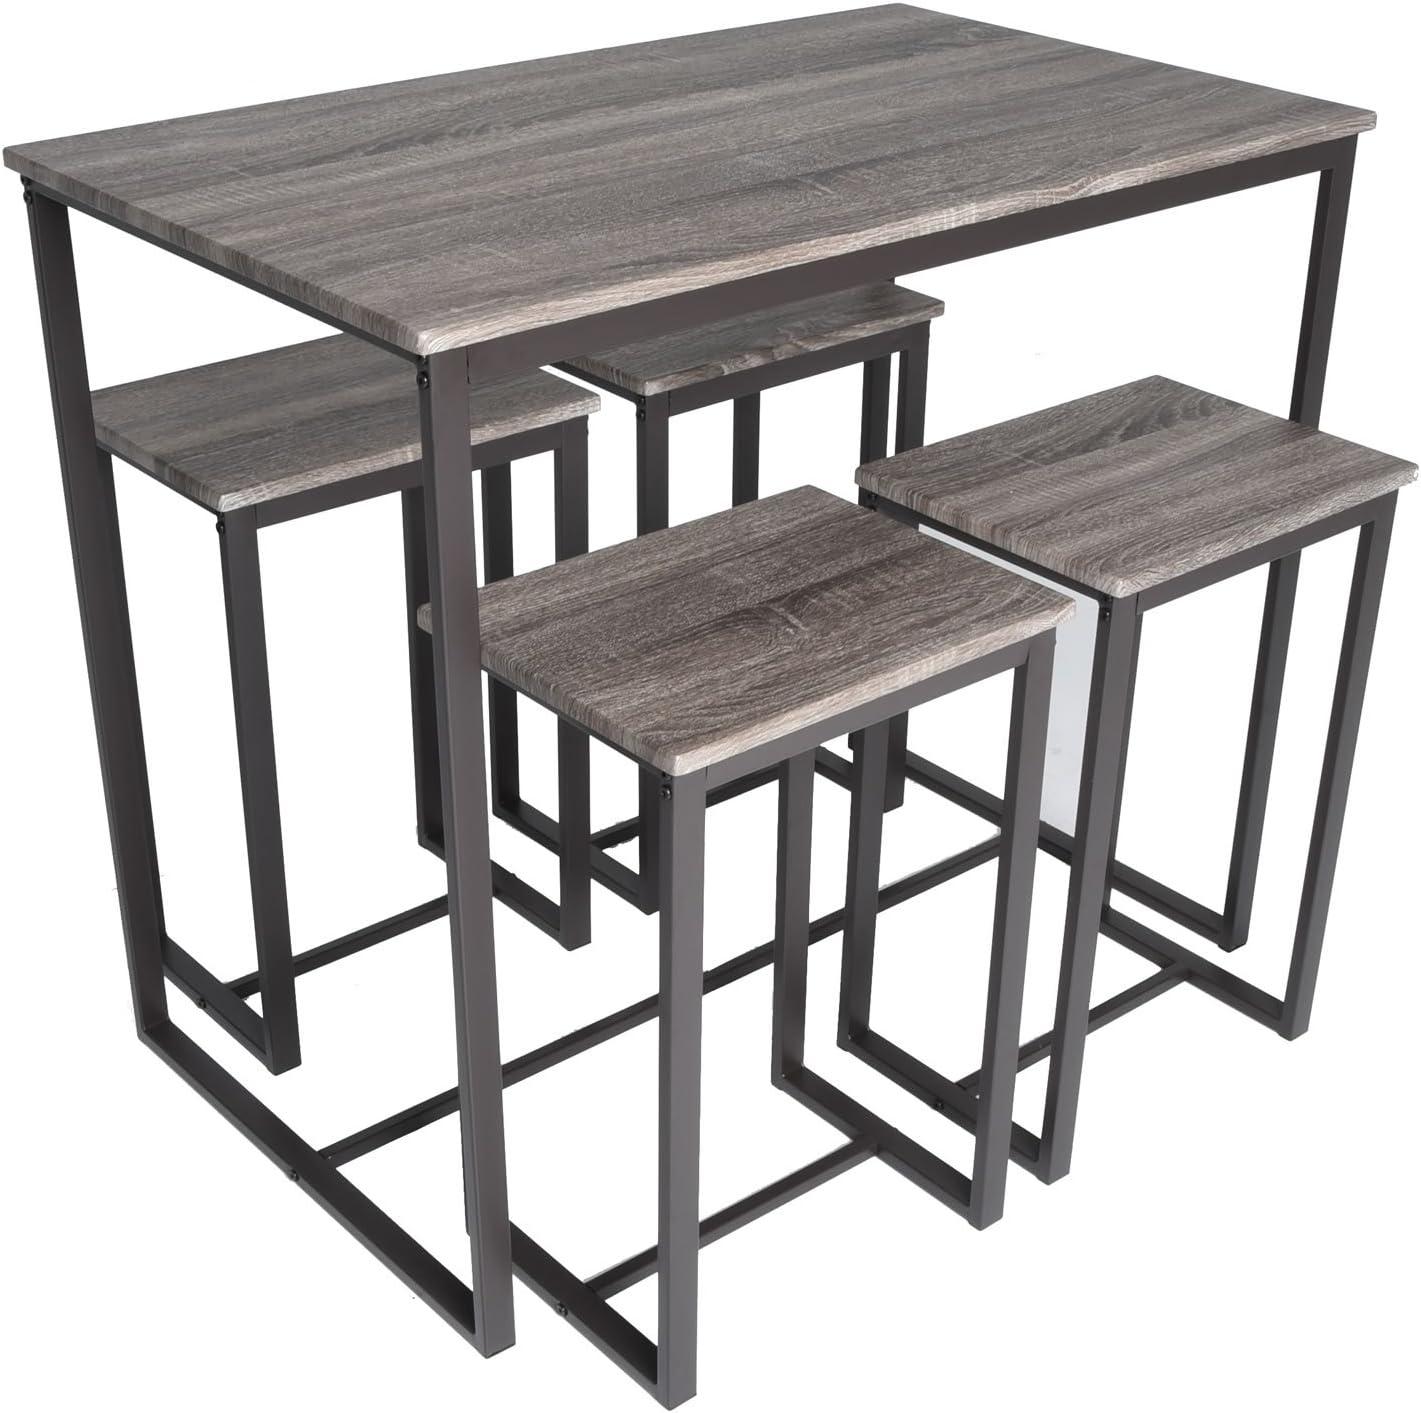 Zenvida 5 Piece Bistro Pub Table Set with 4 Stools